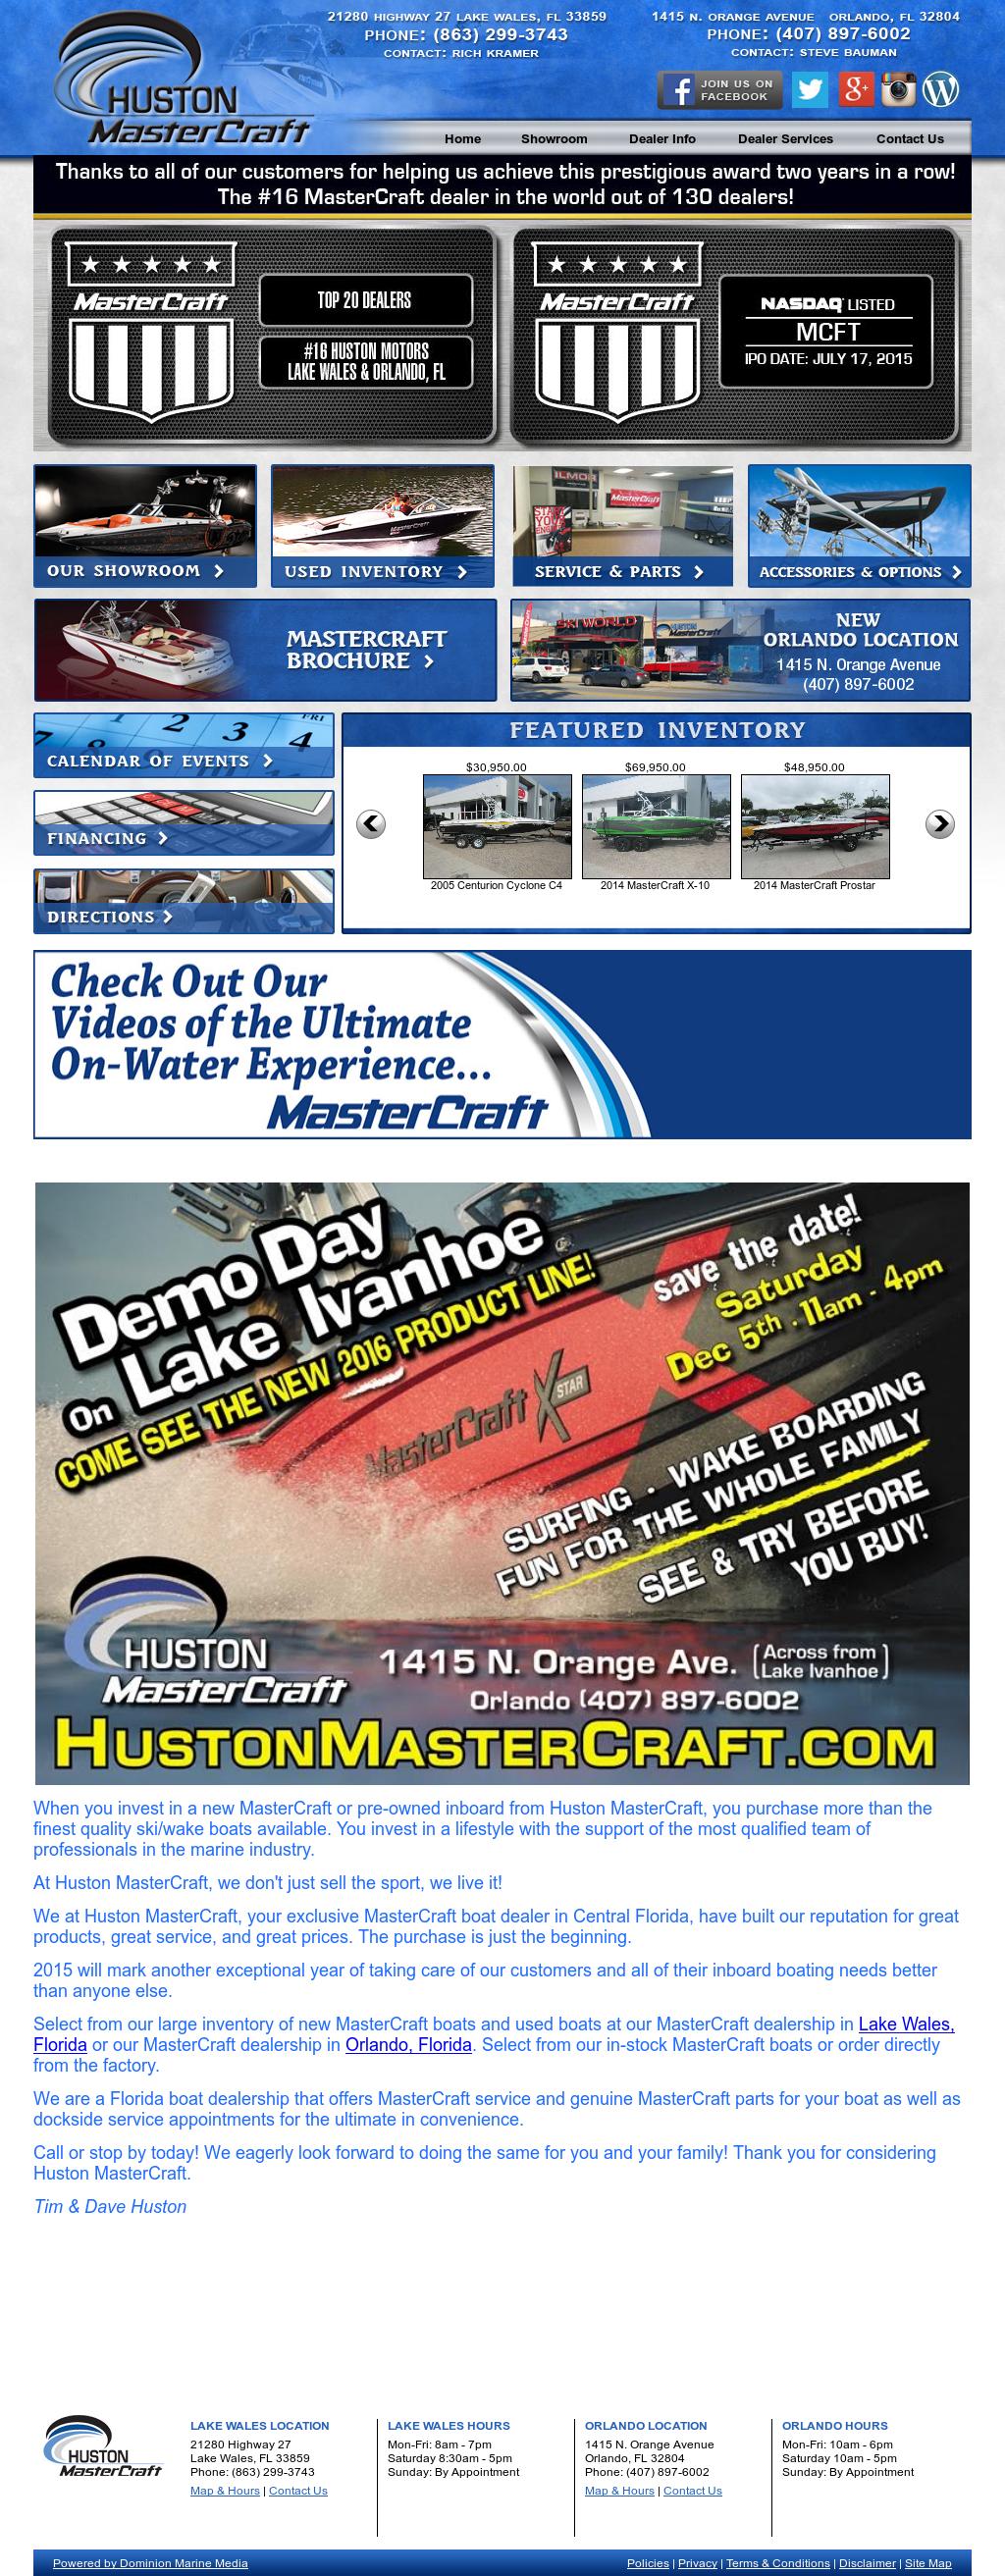 Huston Mastercraft Competitors, Revenue and Employees - Owler Company Profile